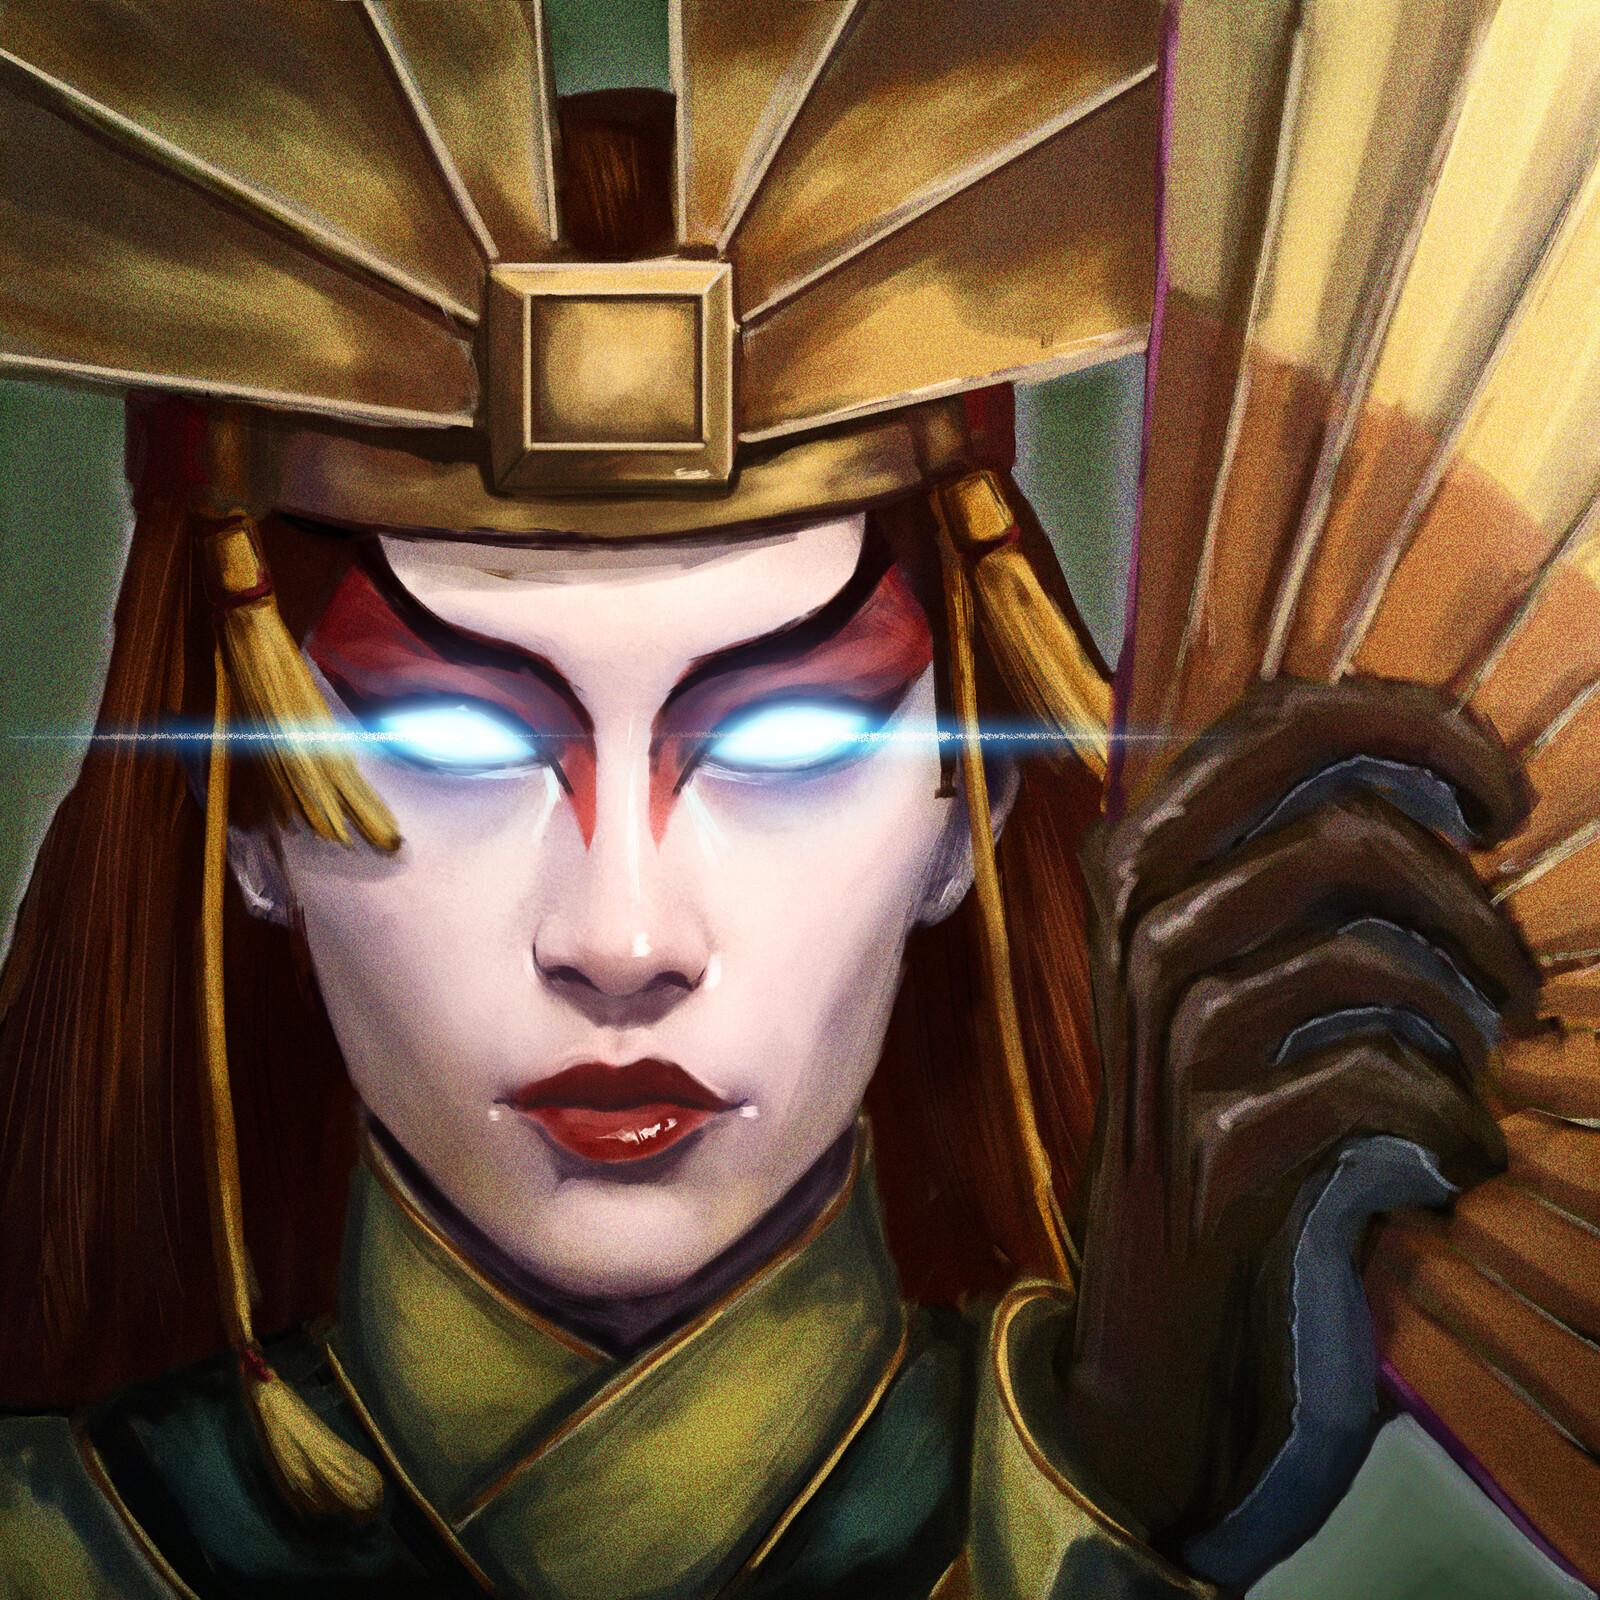 Avatar Kyoshi